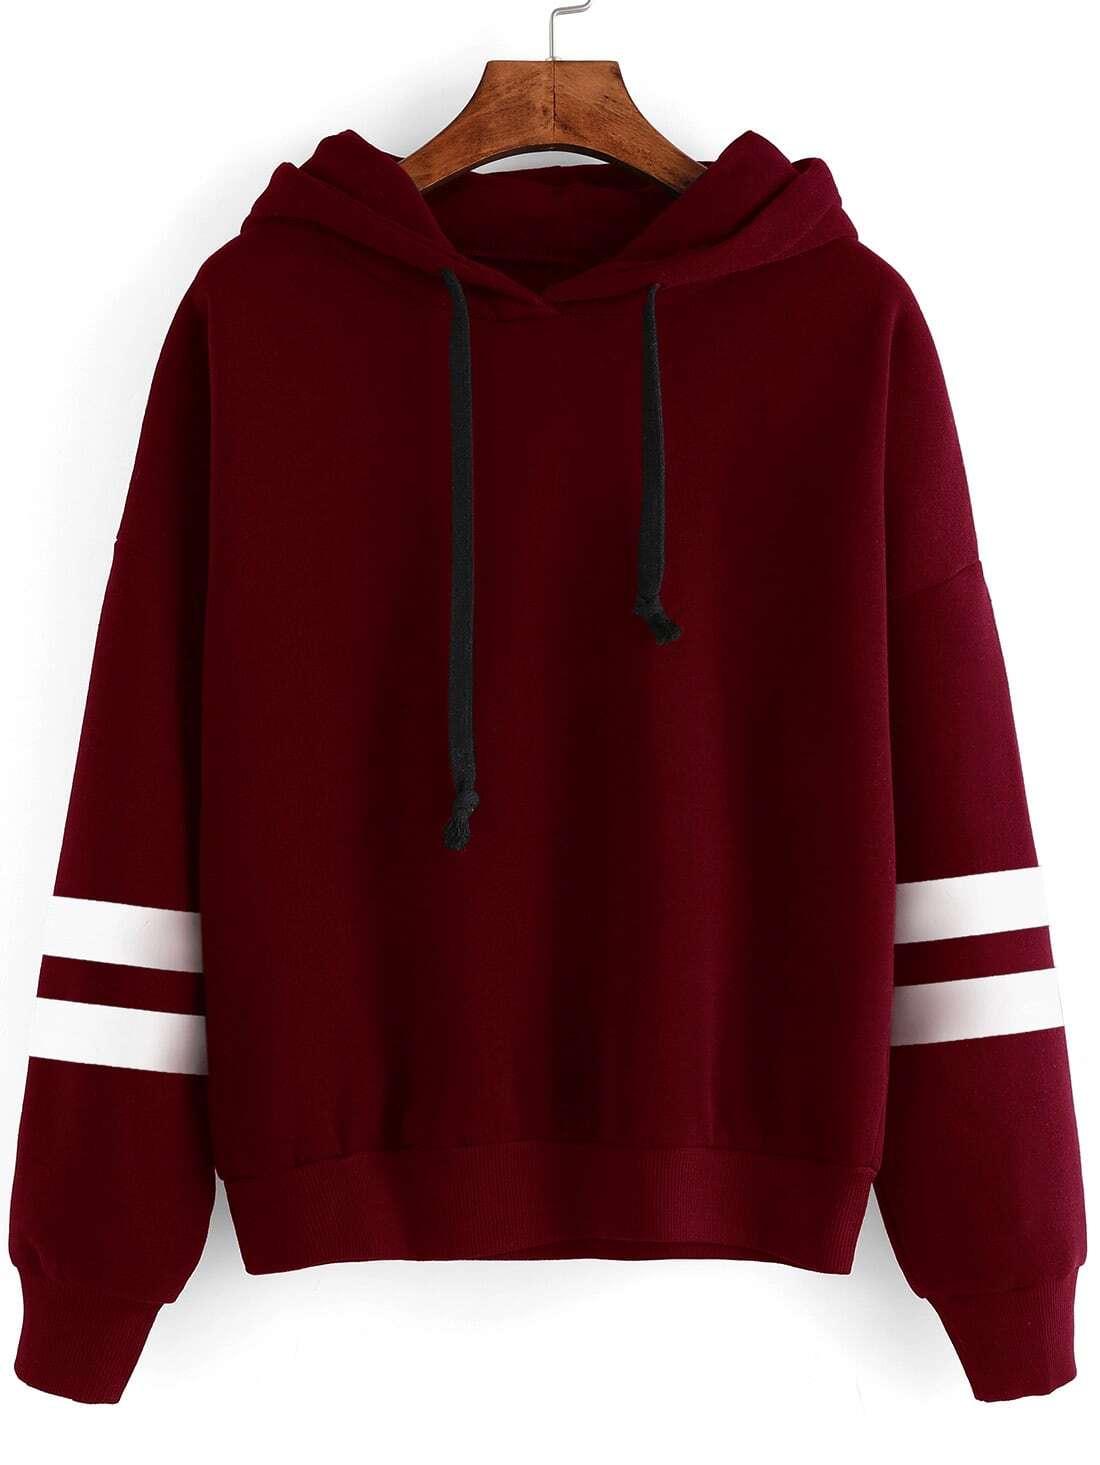 Color Block Black Cat Sweatshirt Pullover